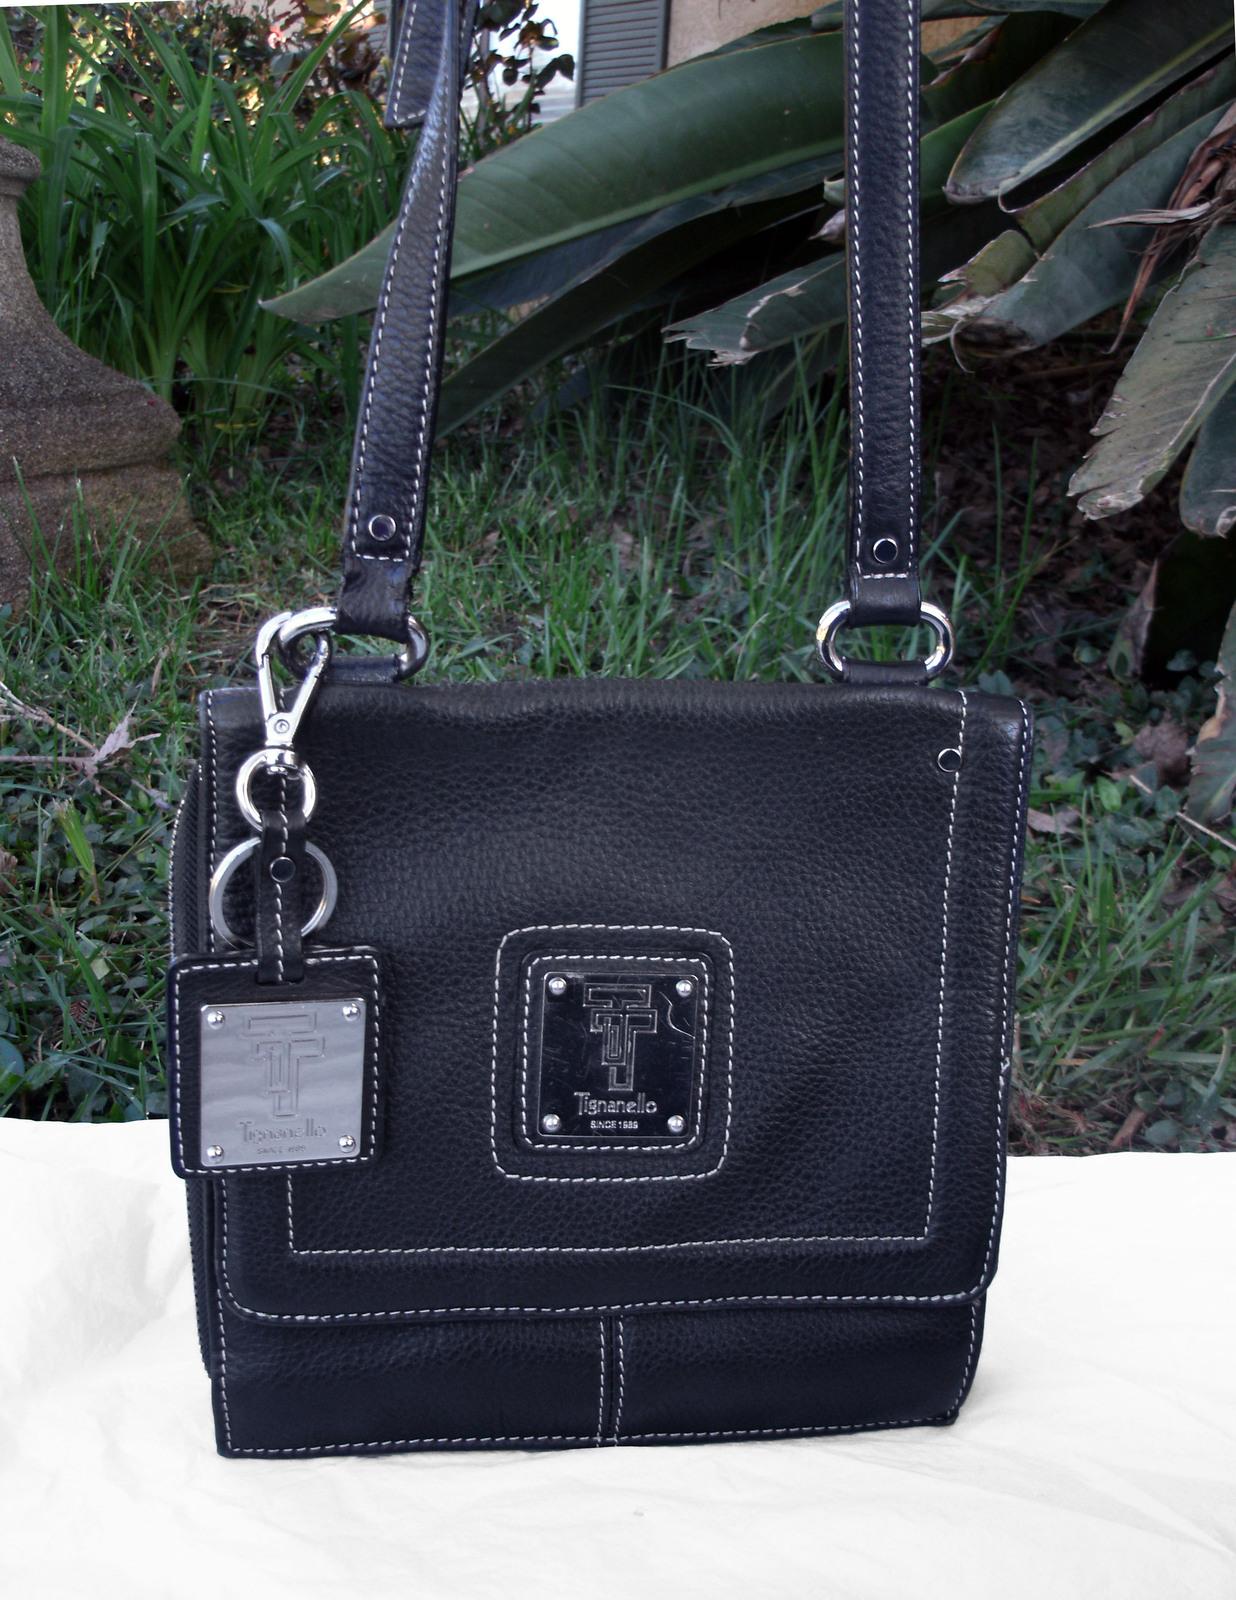 Tignanello Black Pebbled Leather Organizer Crossbody built in Wallet